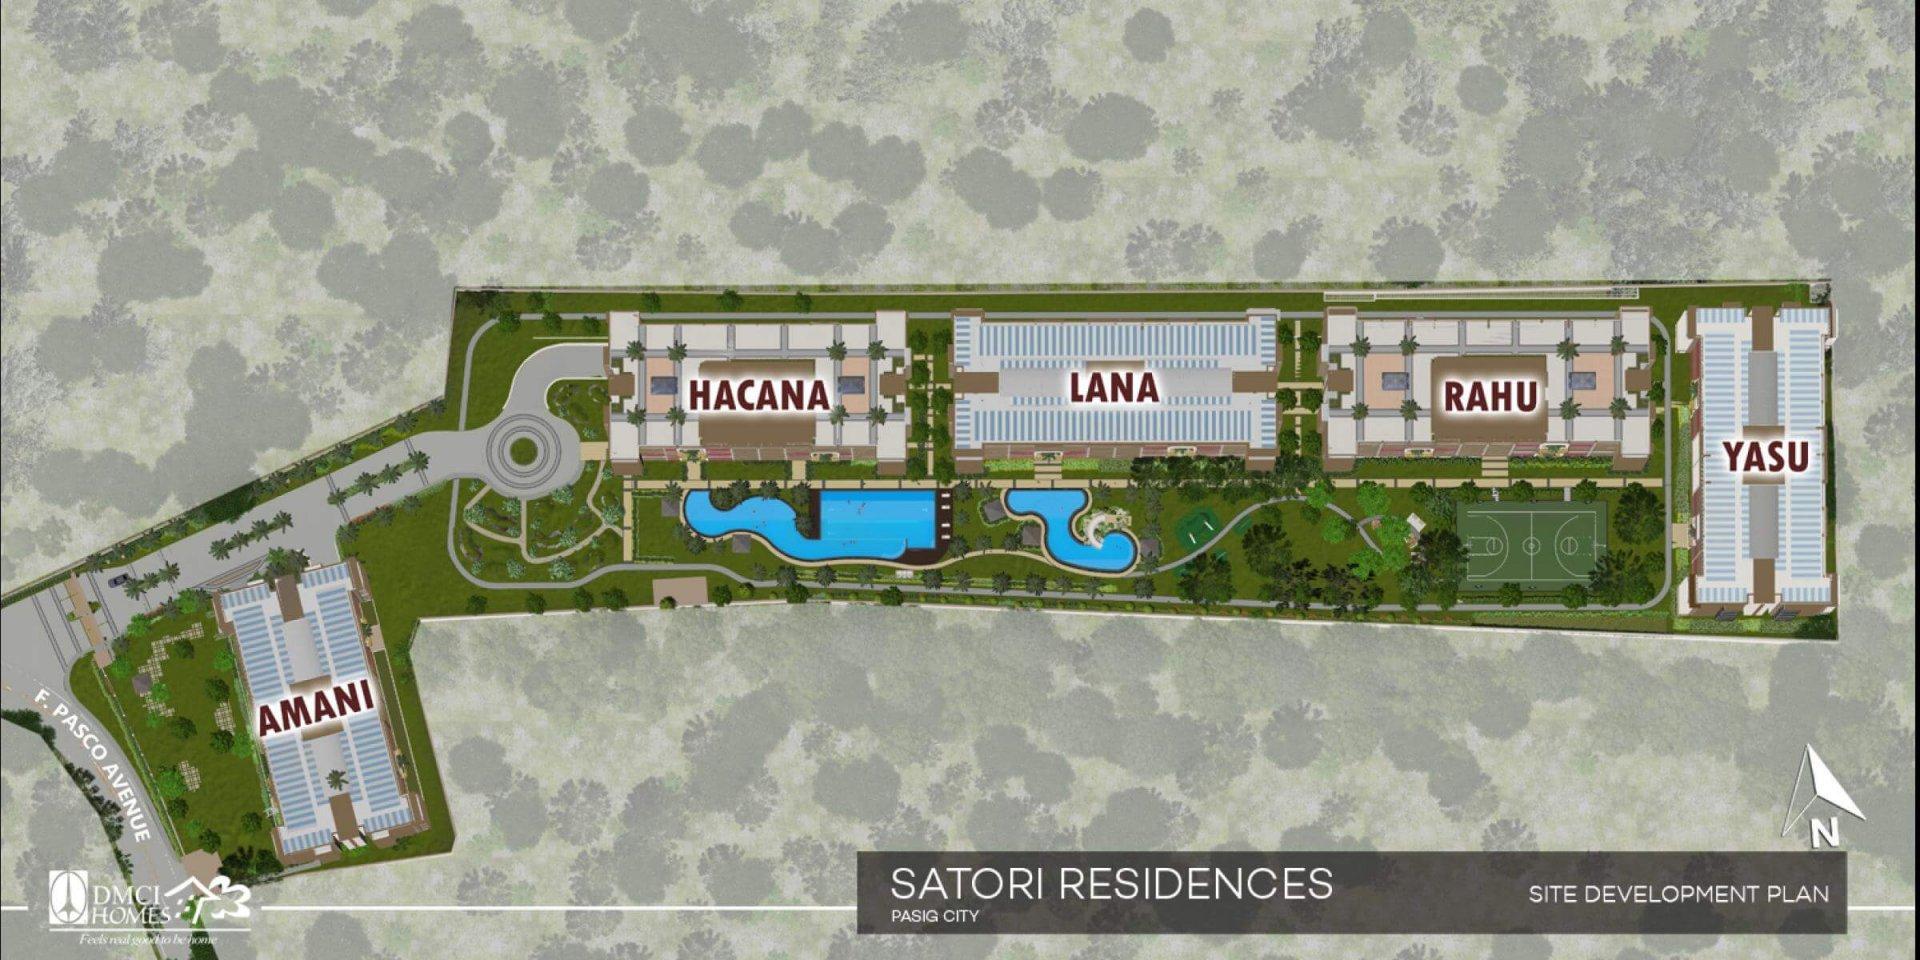 Satori Residences Site Development Plan